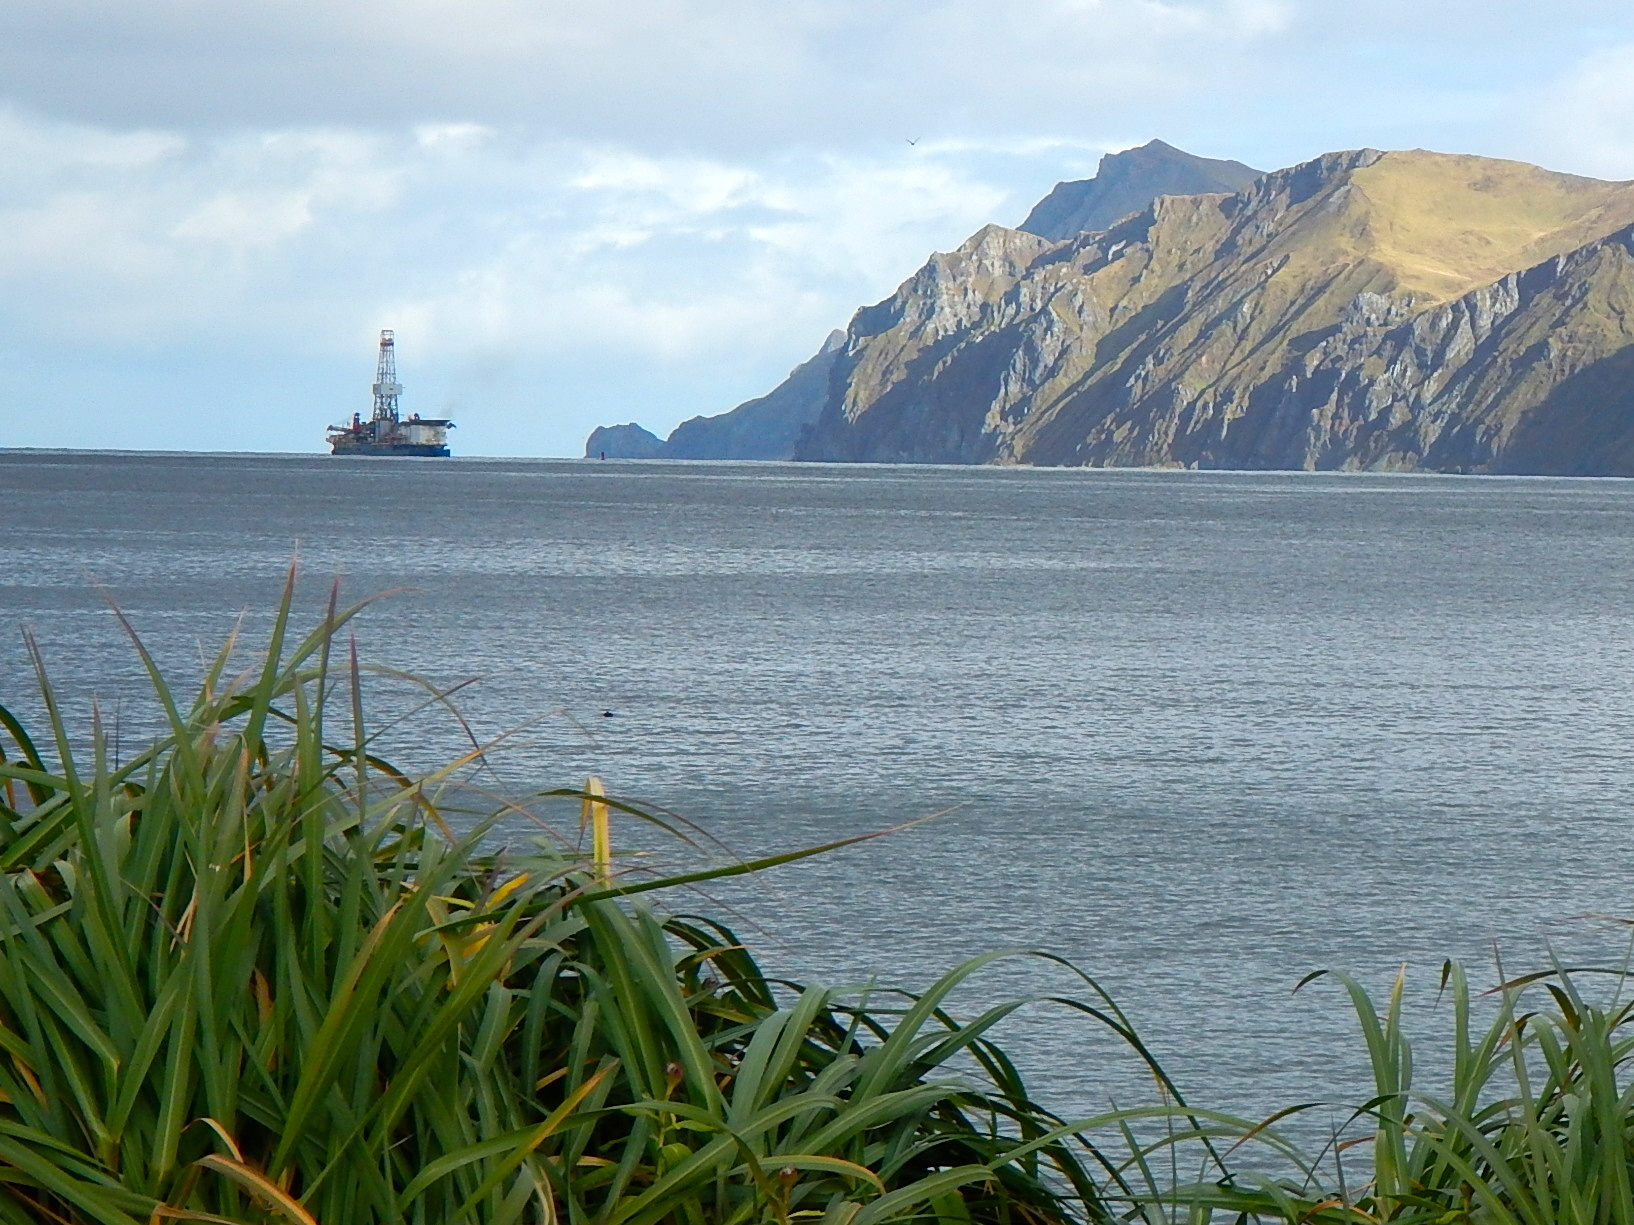 Shell's Noble Discoverer drill rig leaving Unalaska Monday afternoon. (Photo by John Ryan, KUCB - Unalaska)